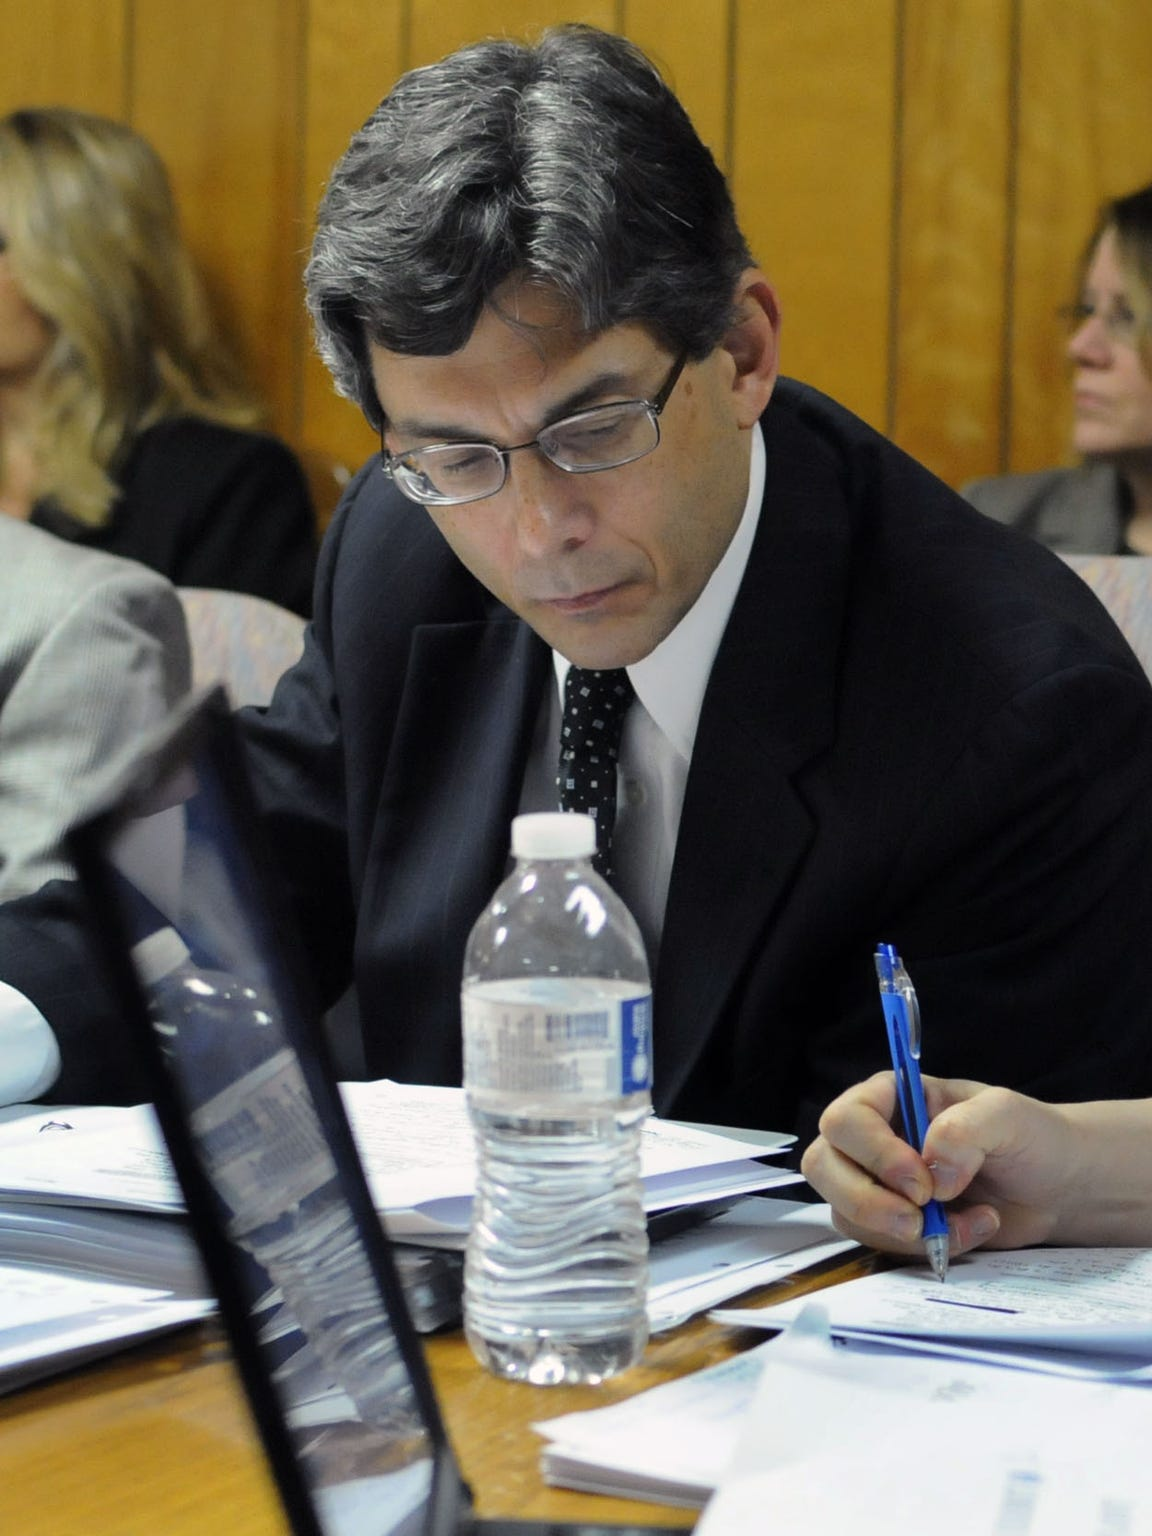 Attorney Stephen Hampton